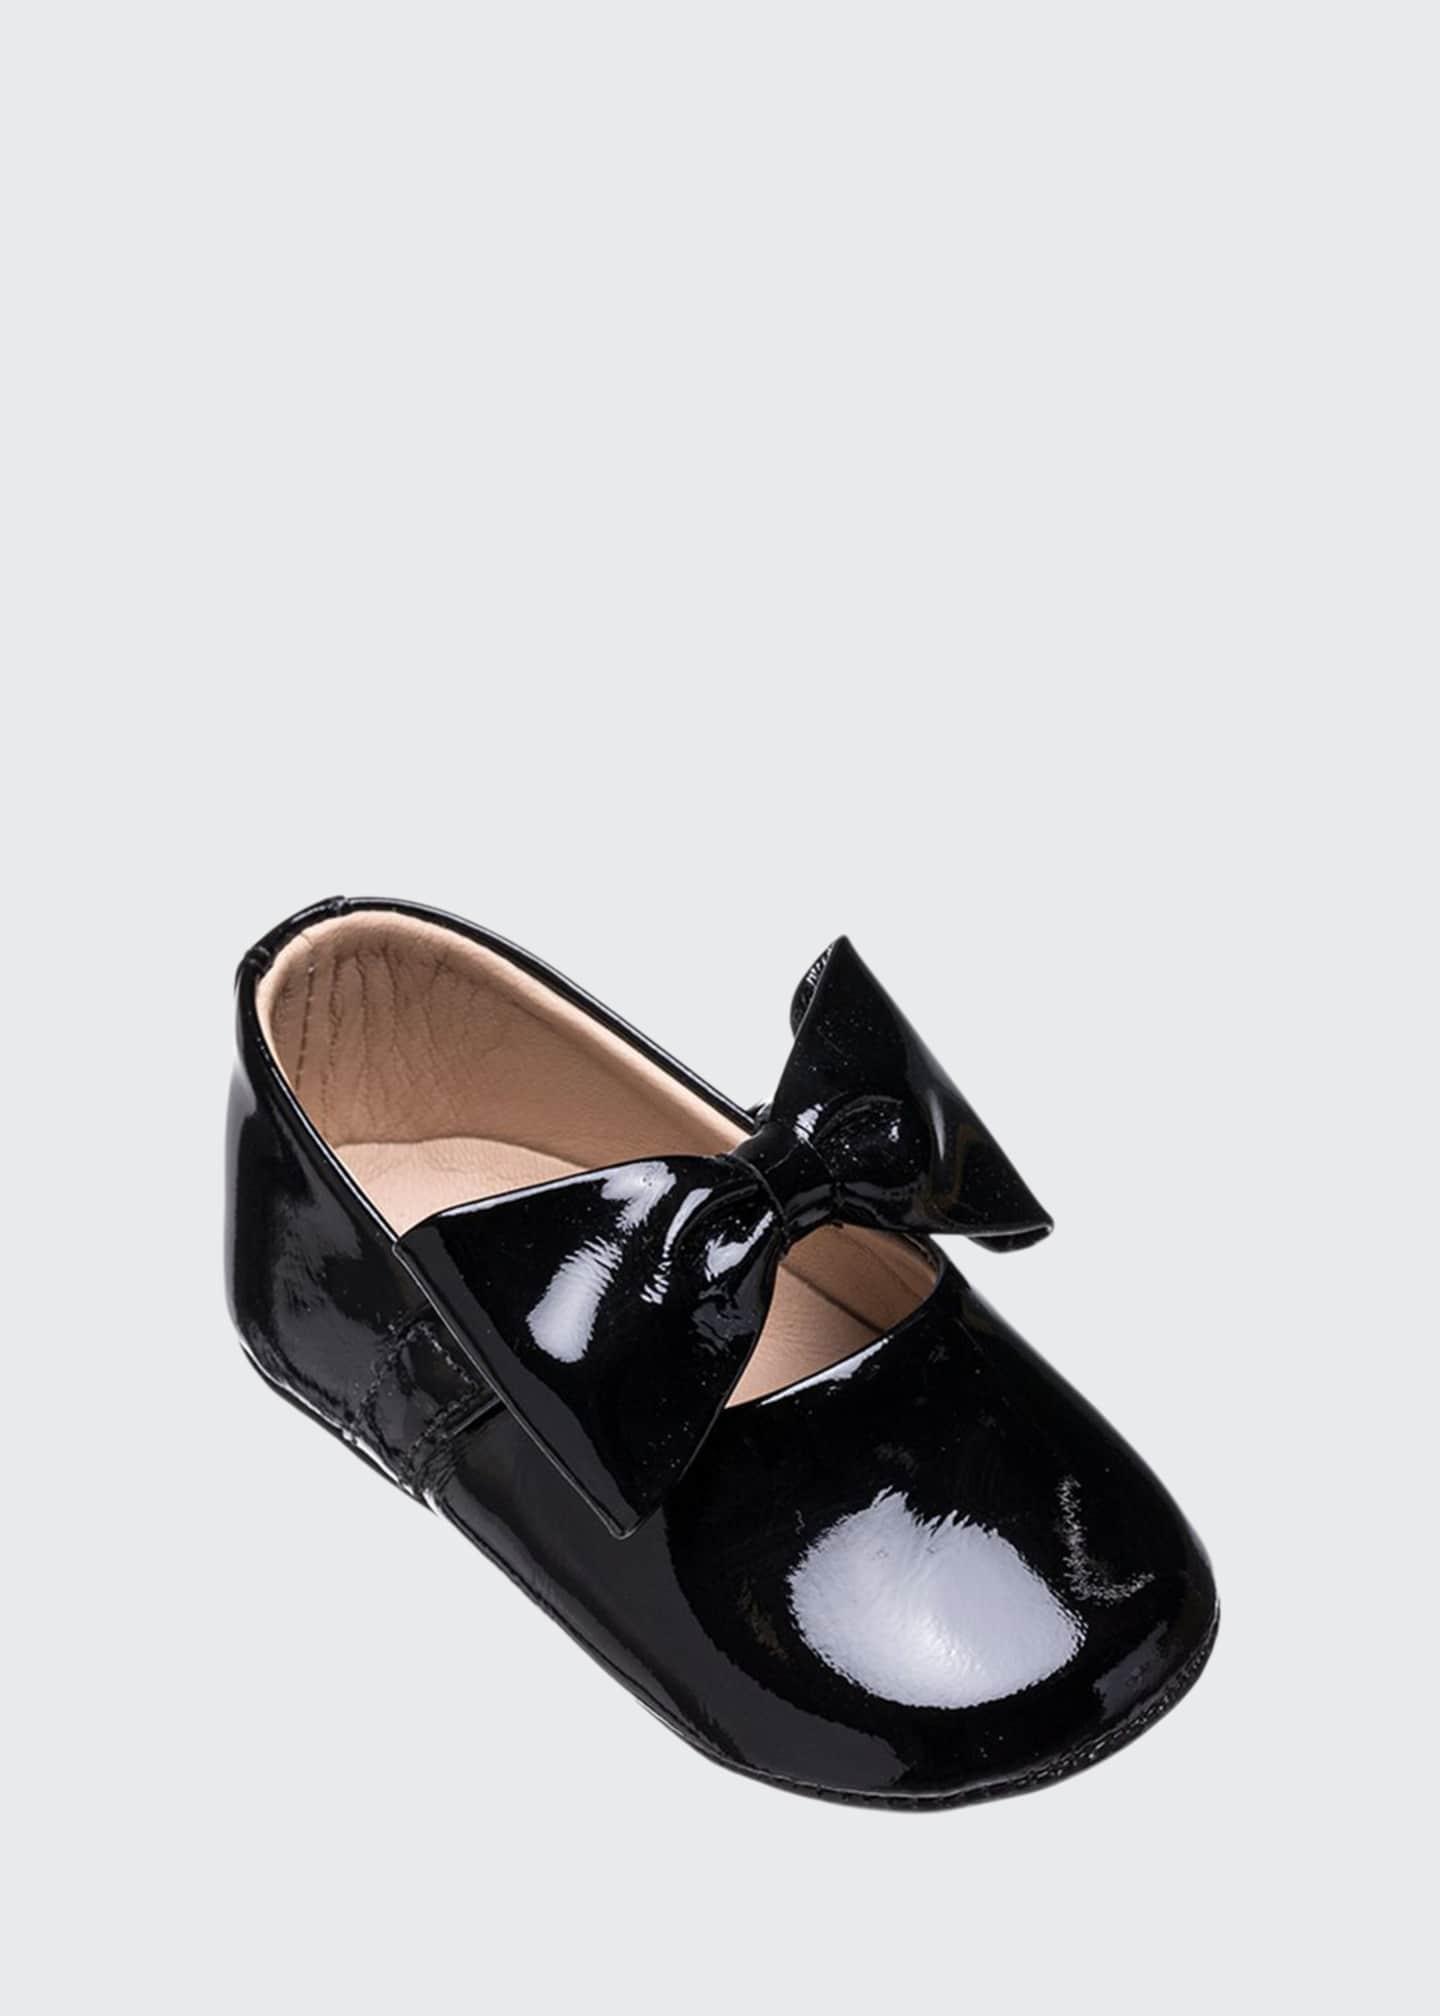 Elephantito Leather Ballet Flat w/ Bow, Baby